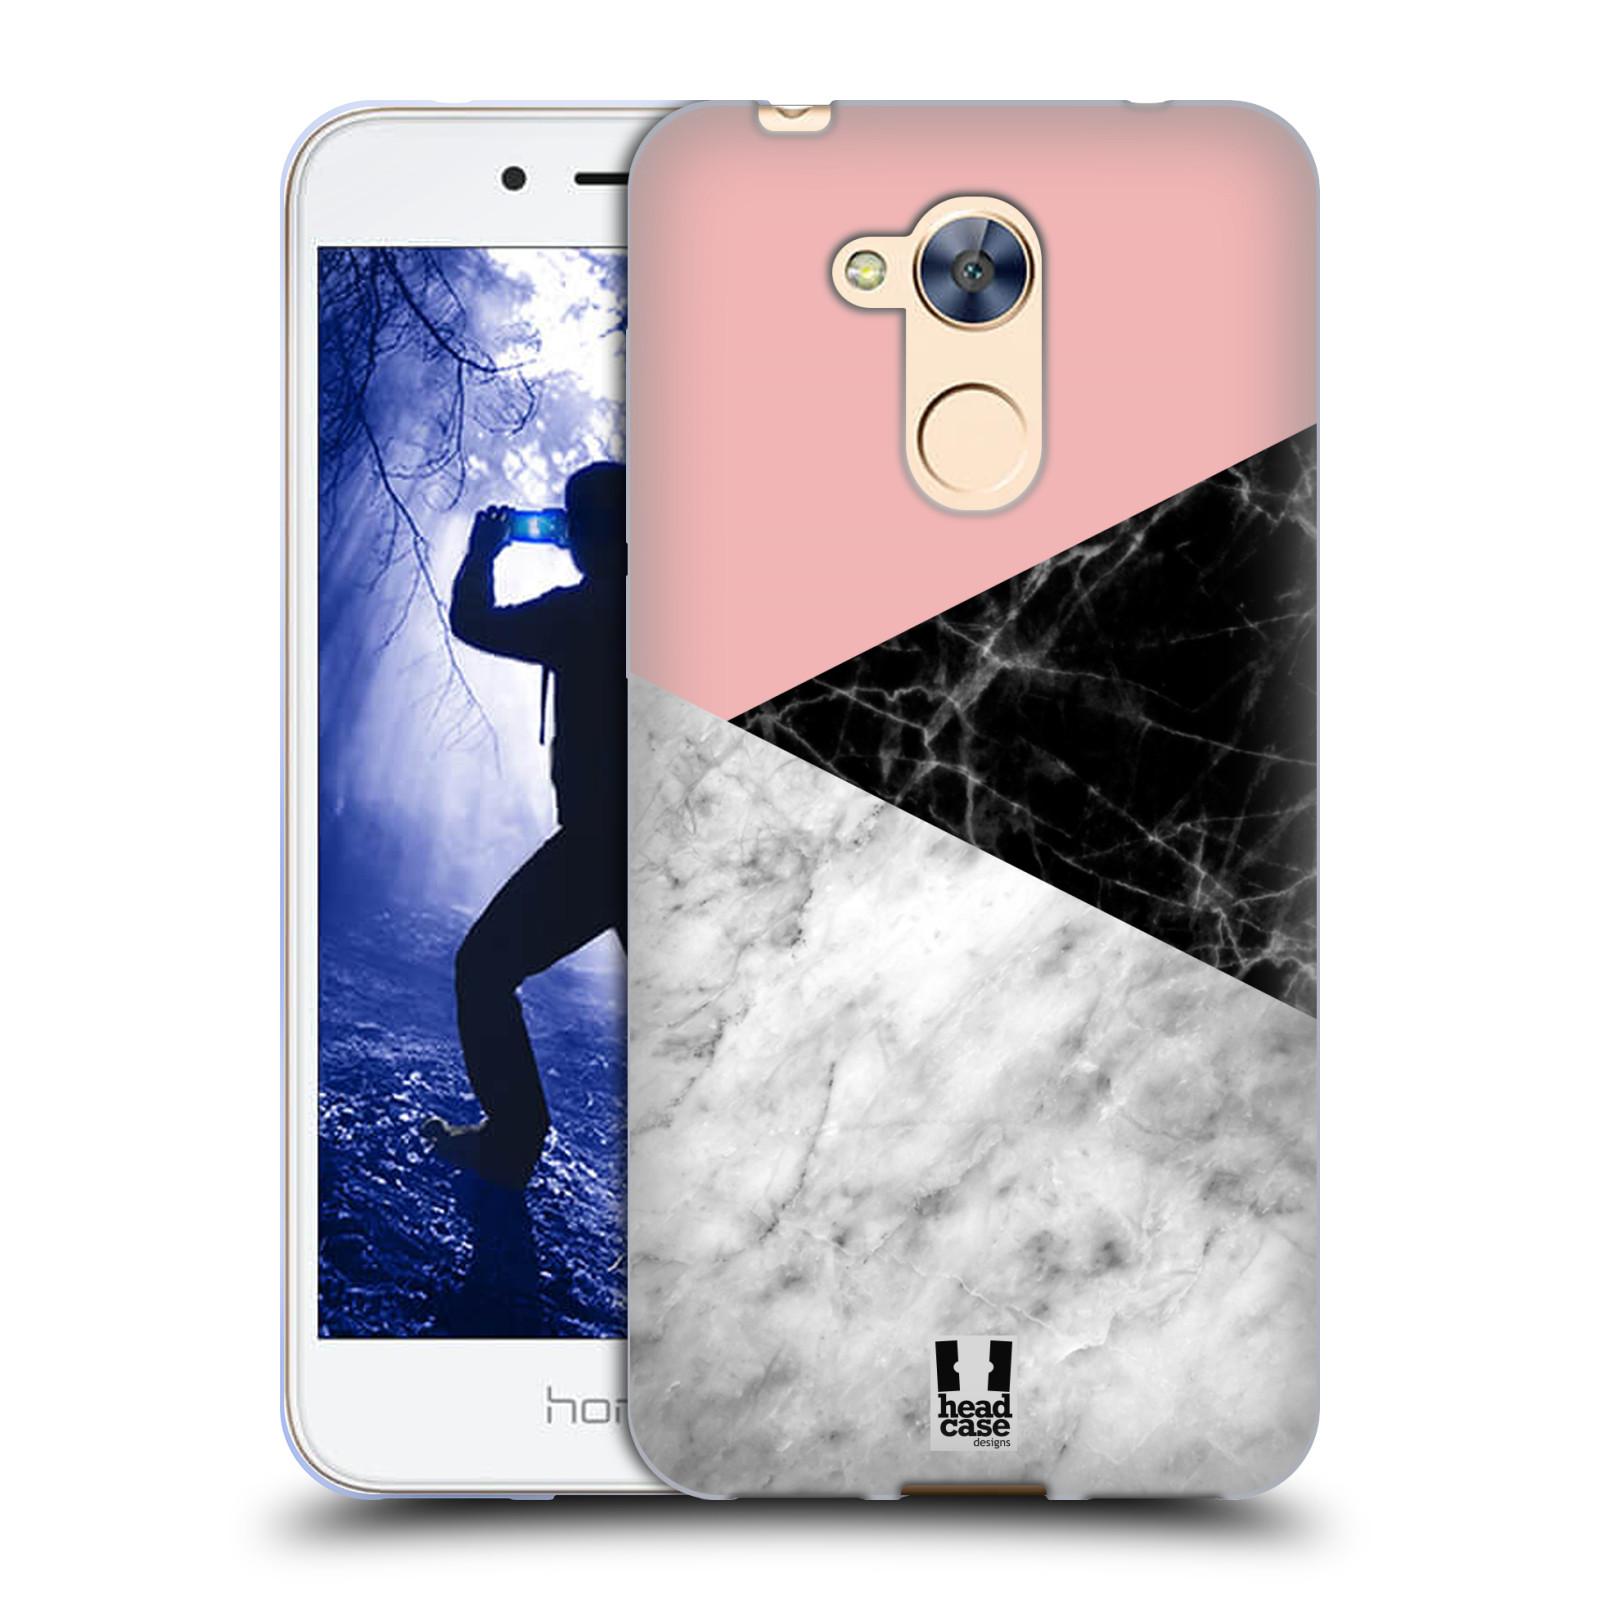 Silikonové pouzdro na mobil Honor 6A - Head Case - Mramor mix